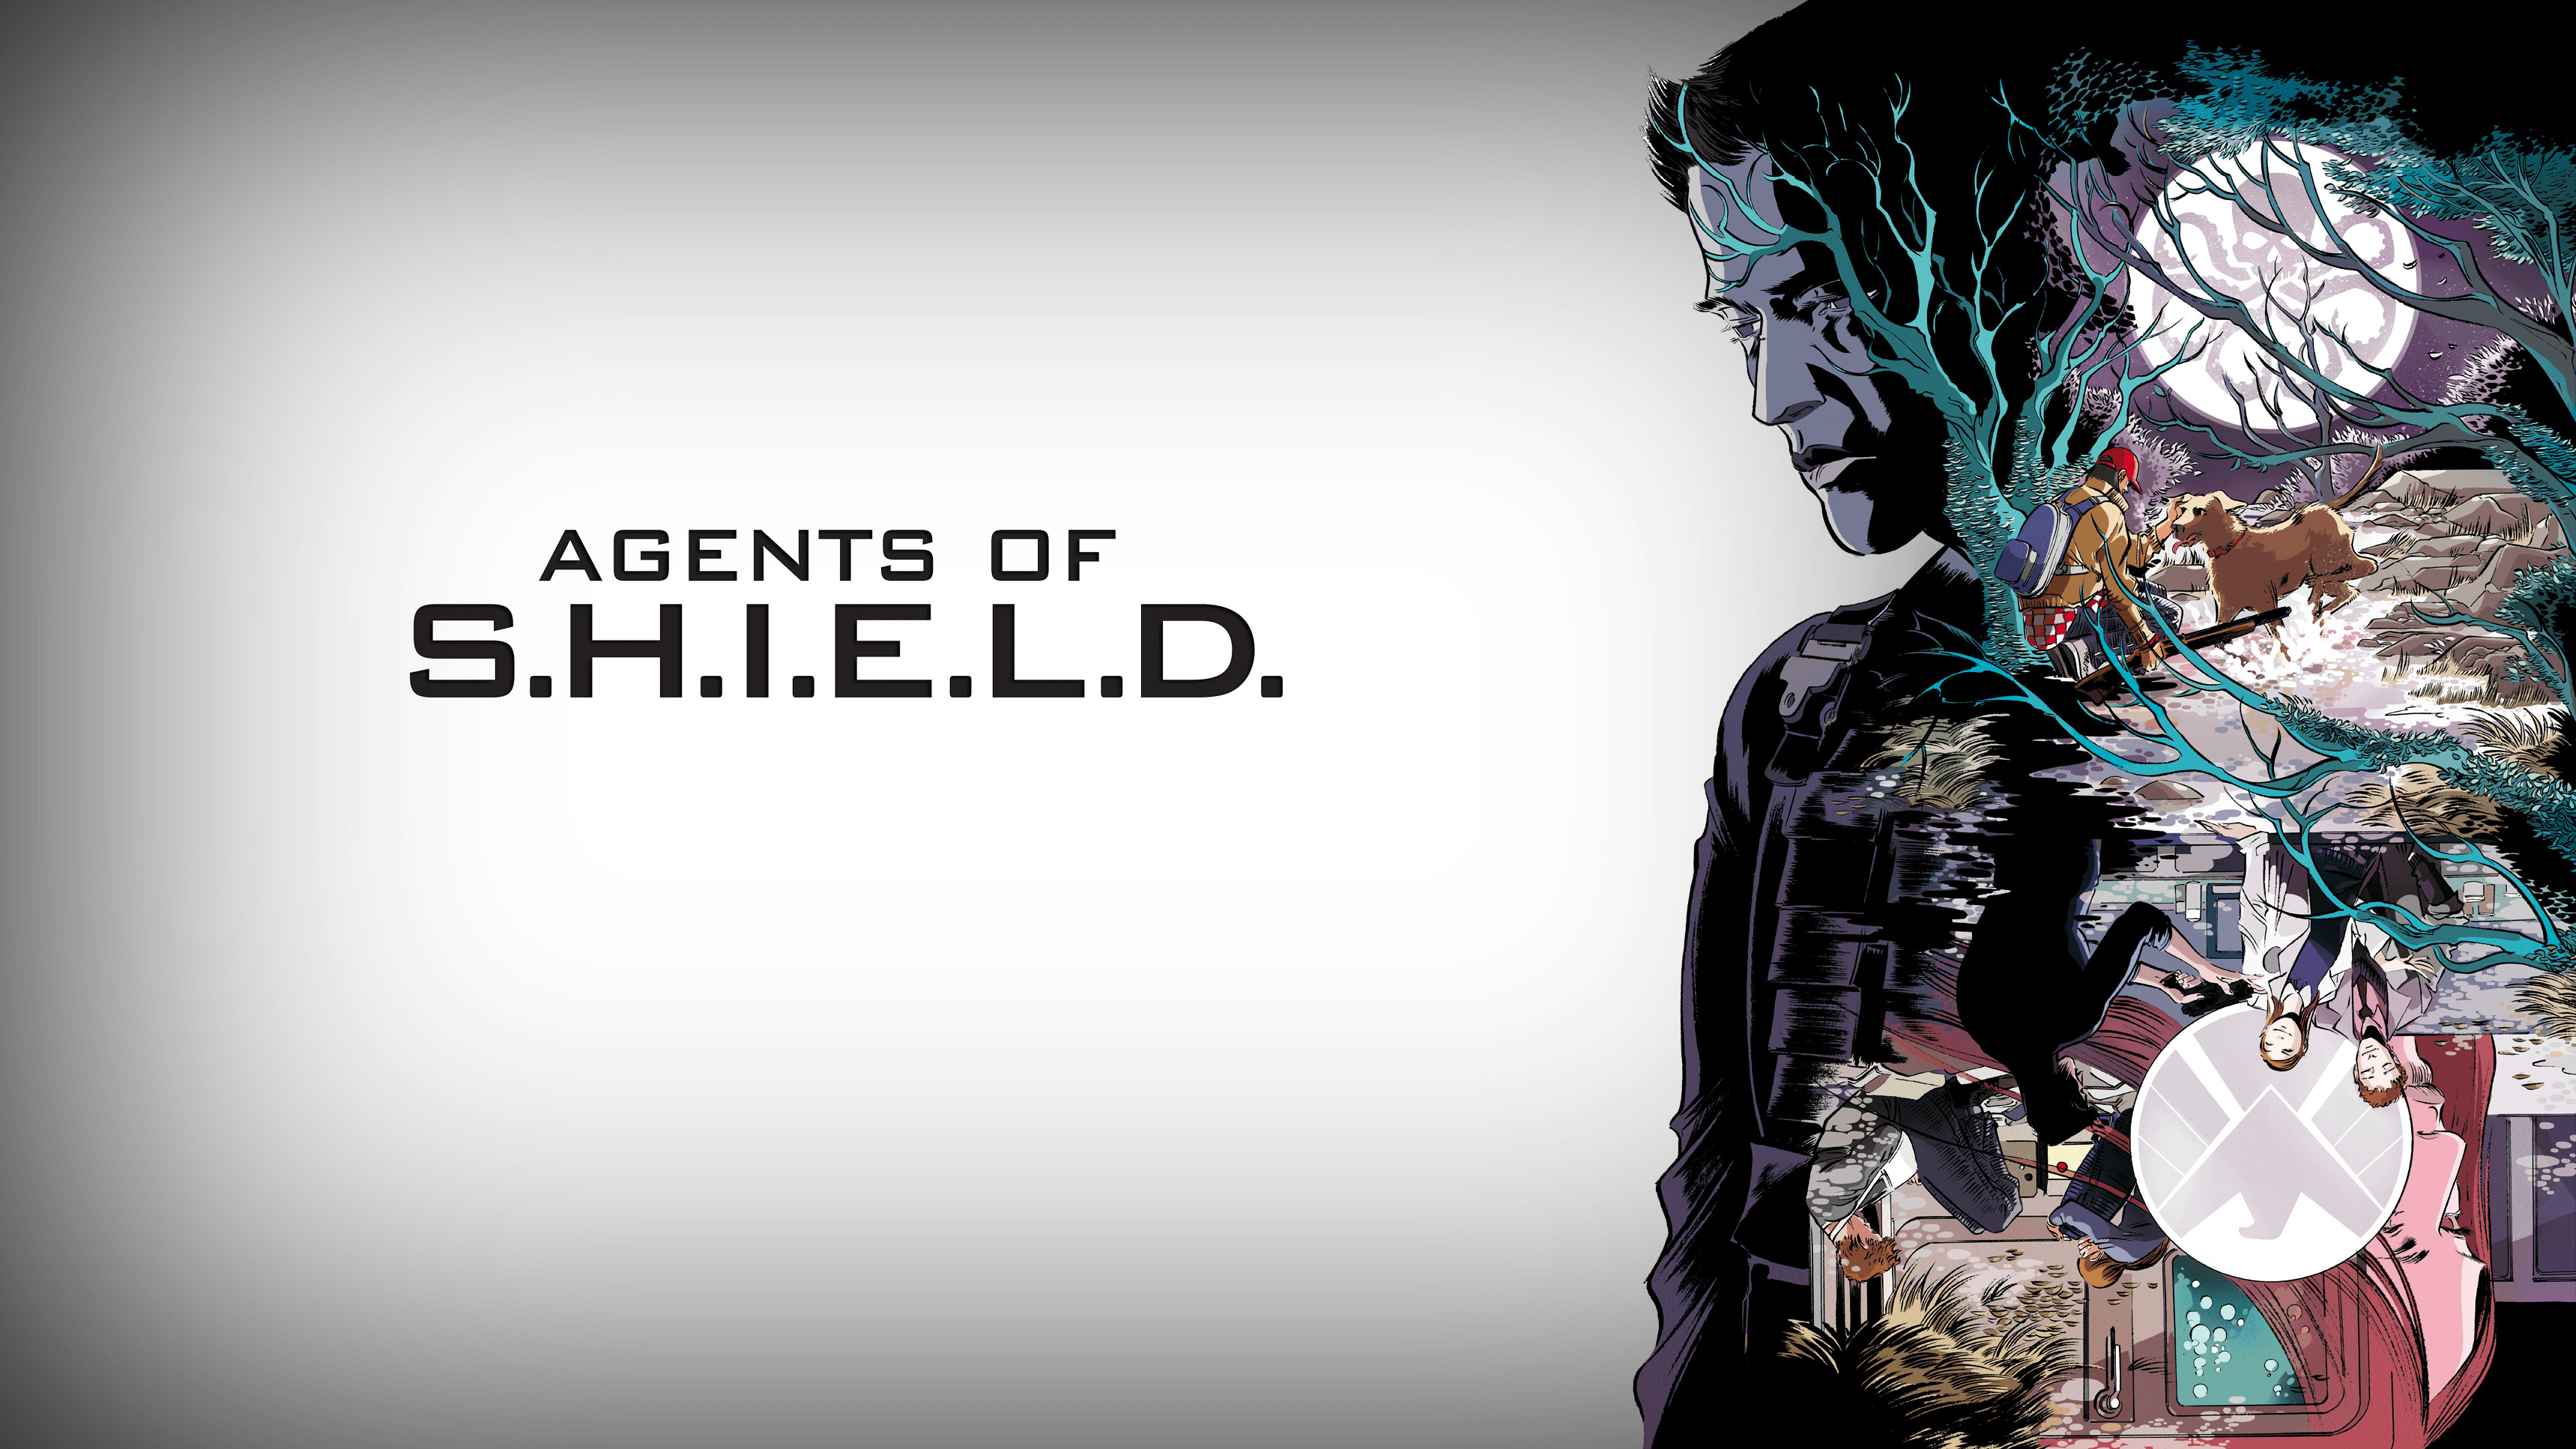 Agents Of S.H.I.E.L.D. Marvel Cinematic Universe 33380 …